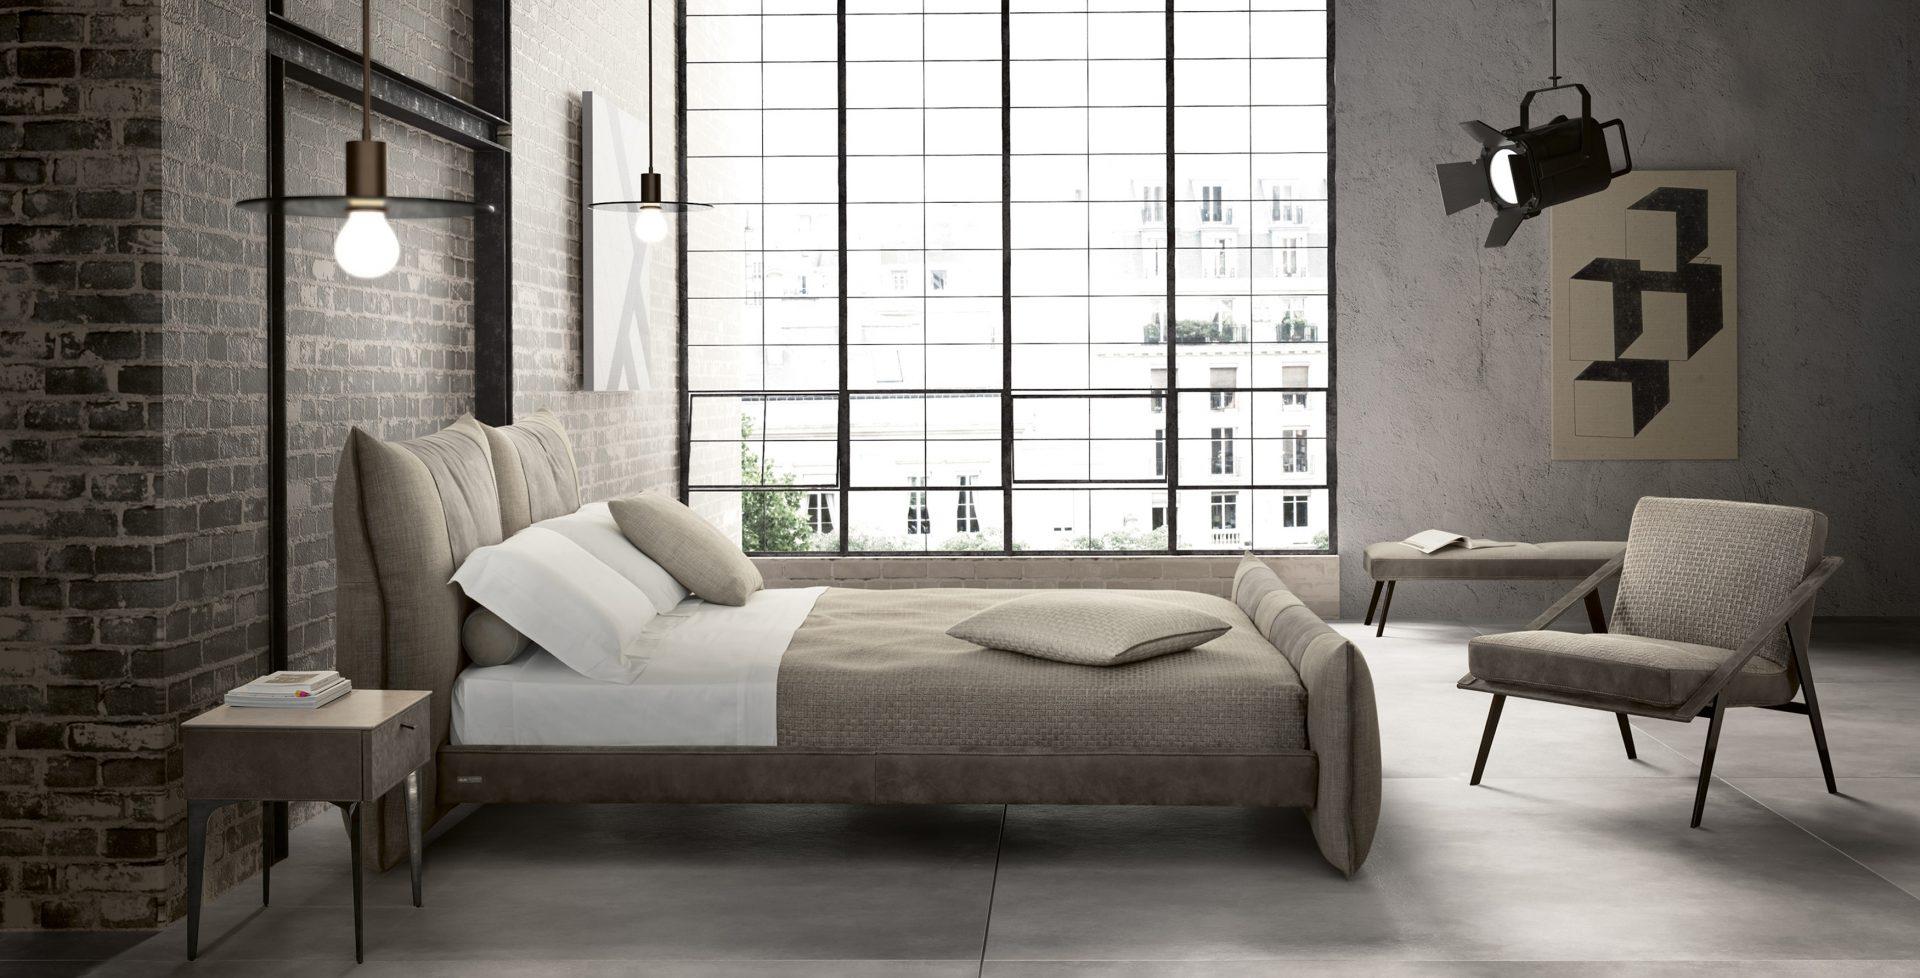 Pepper Bed